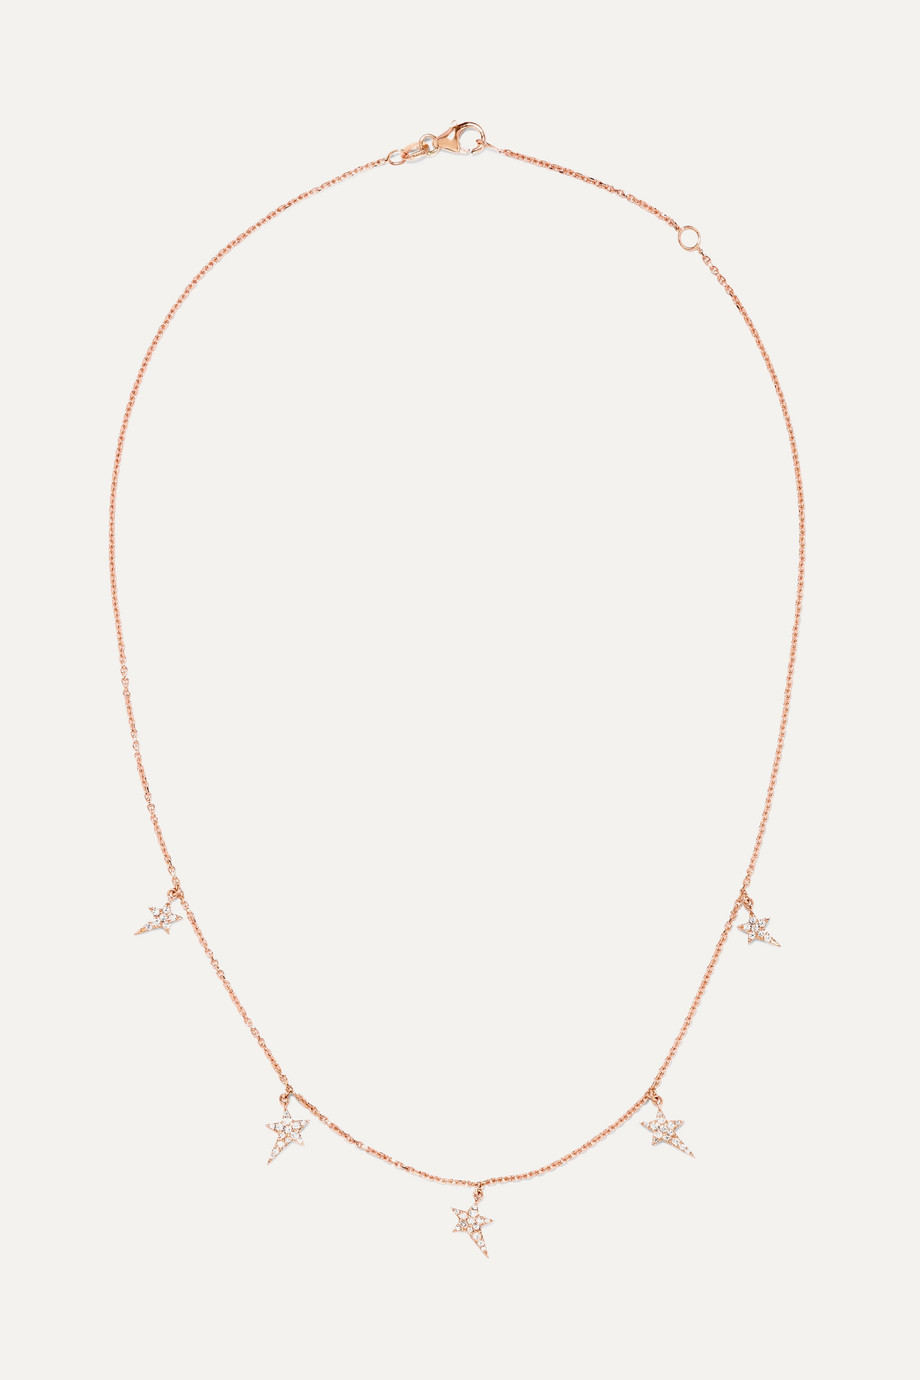 Diane Kordas Star 18K 玫瑰金钻石项链